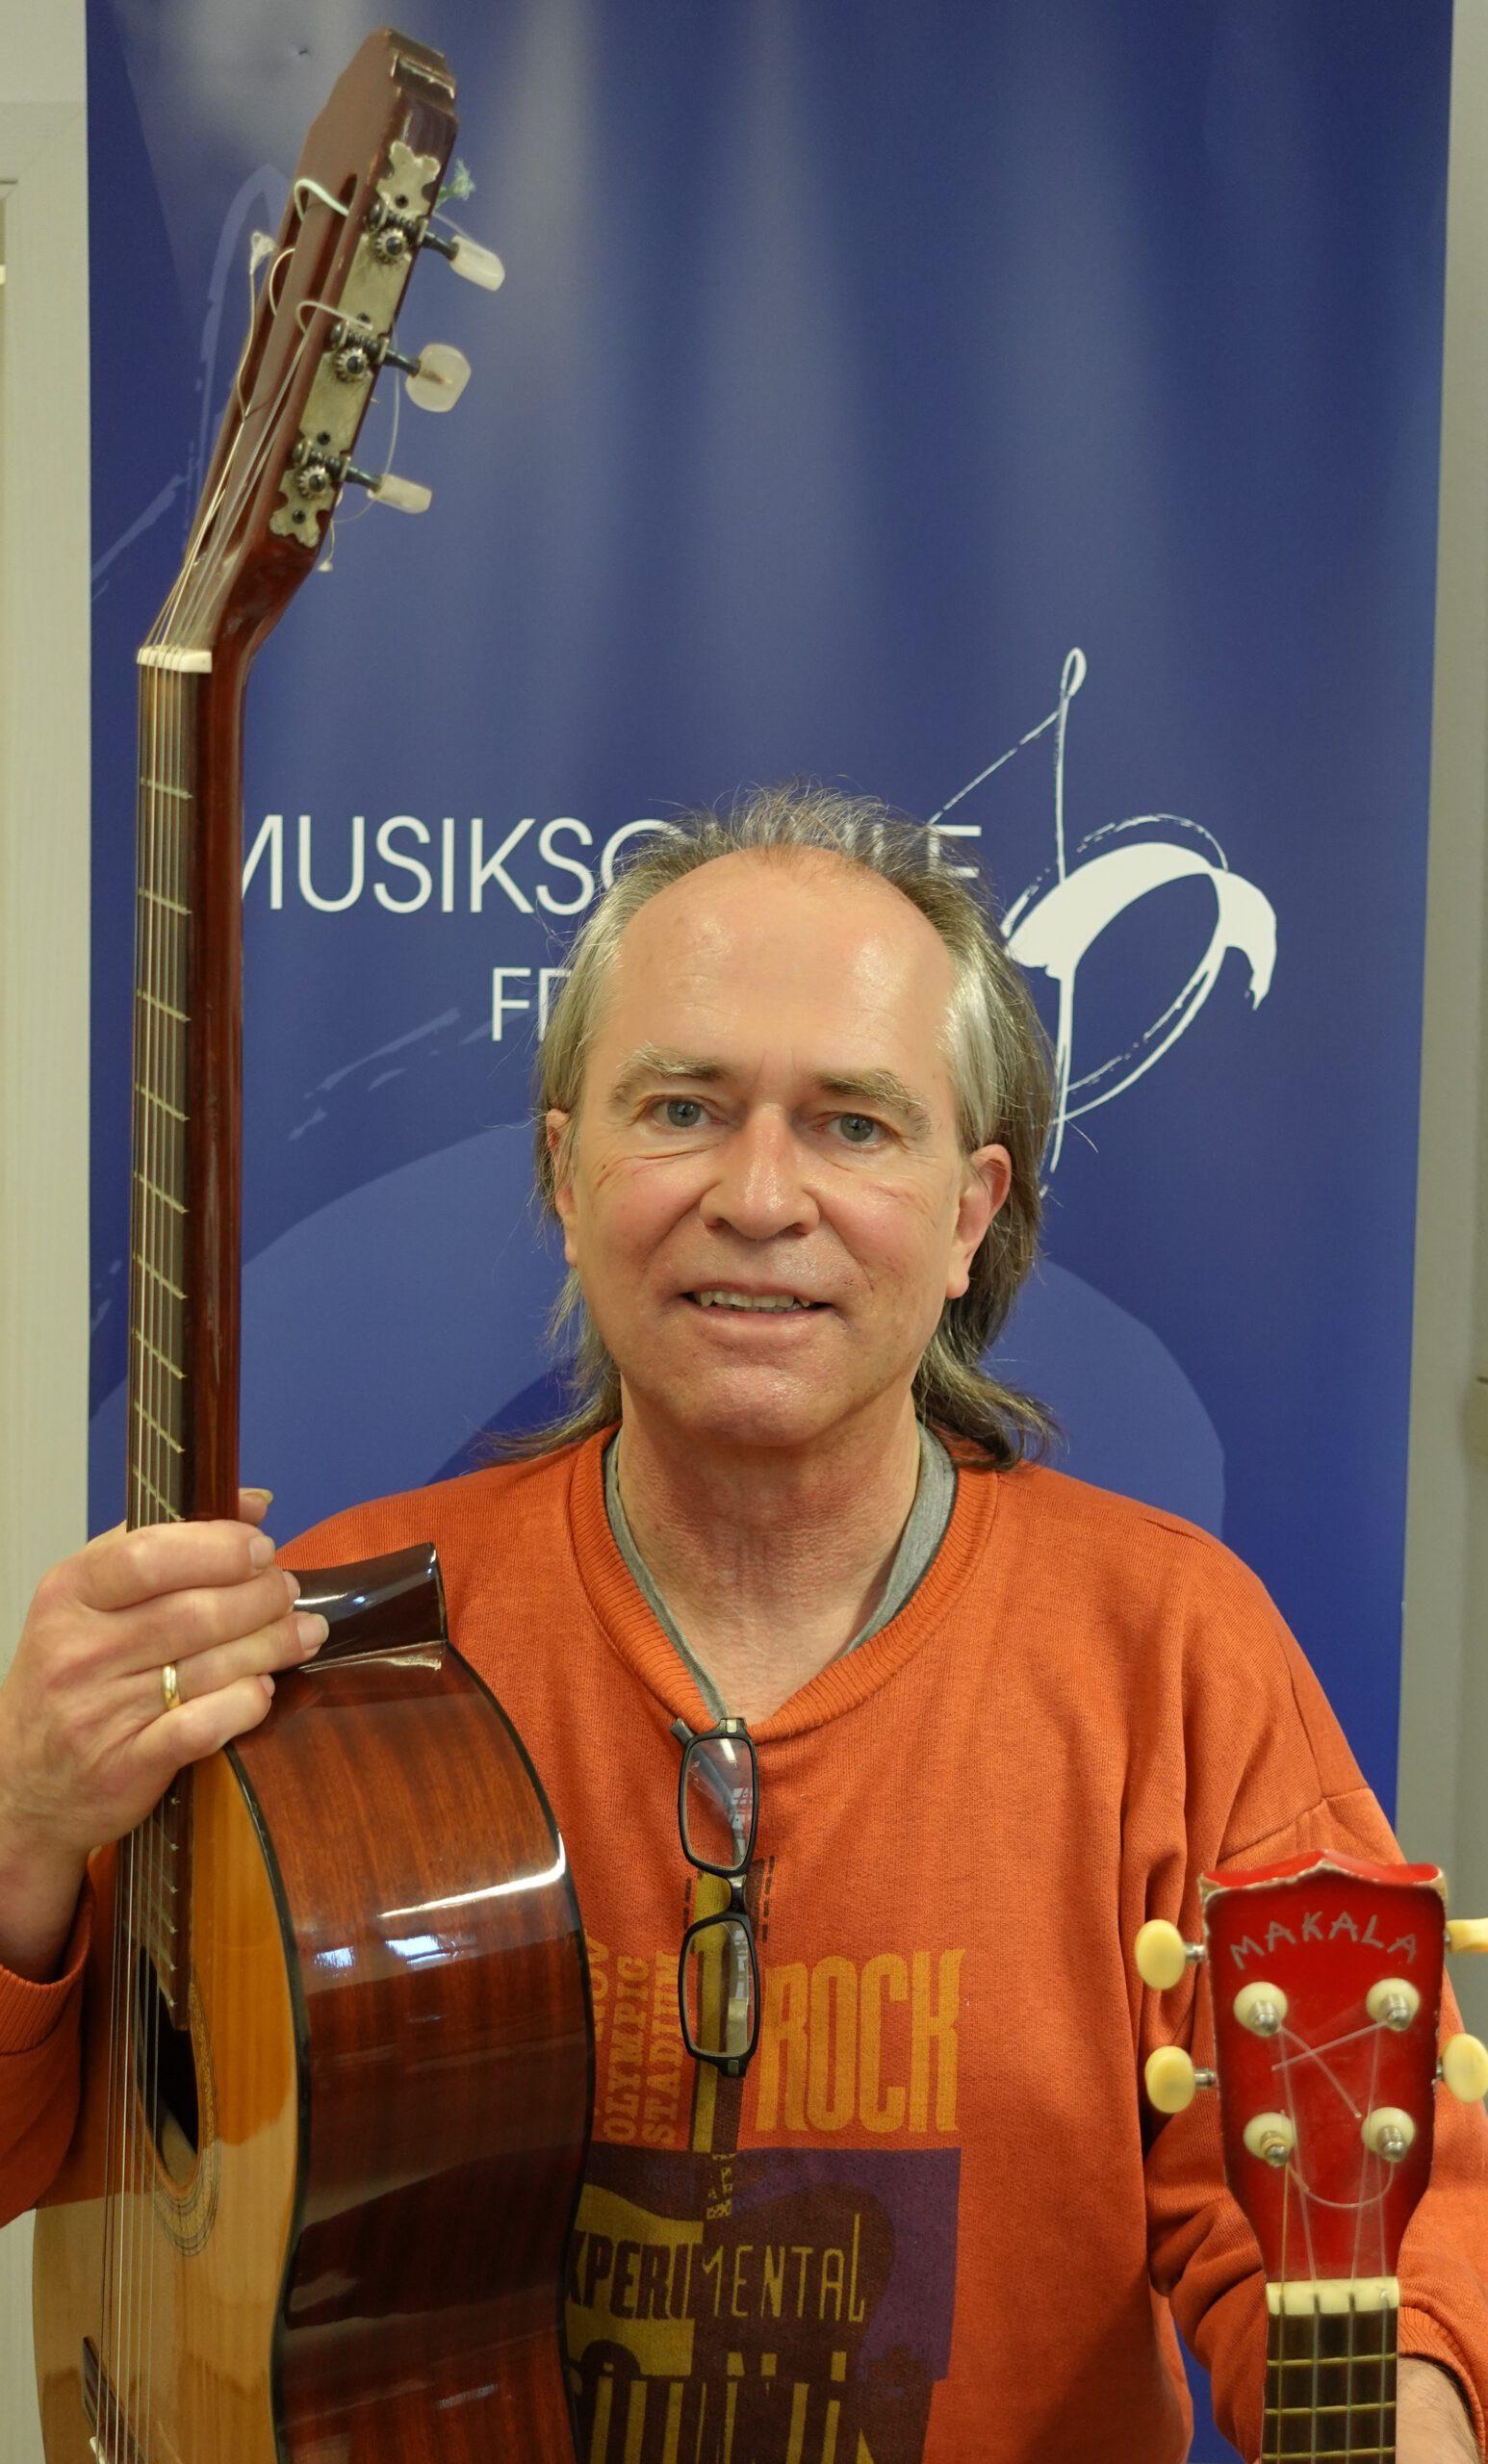 Robert Langstroff